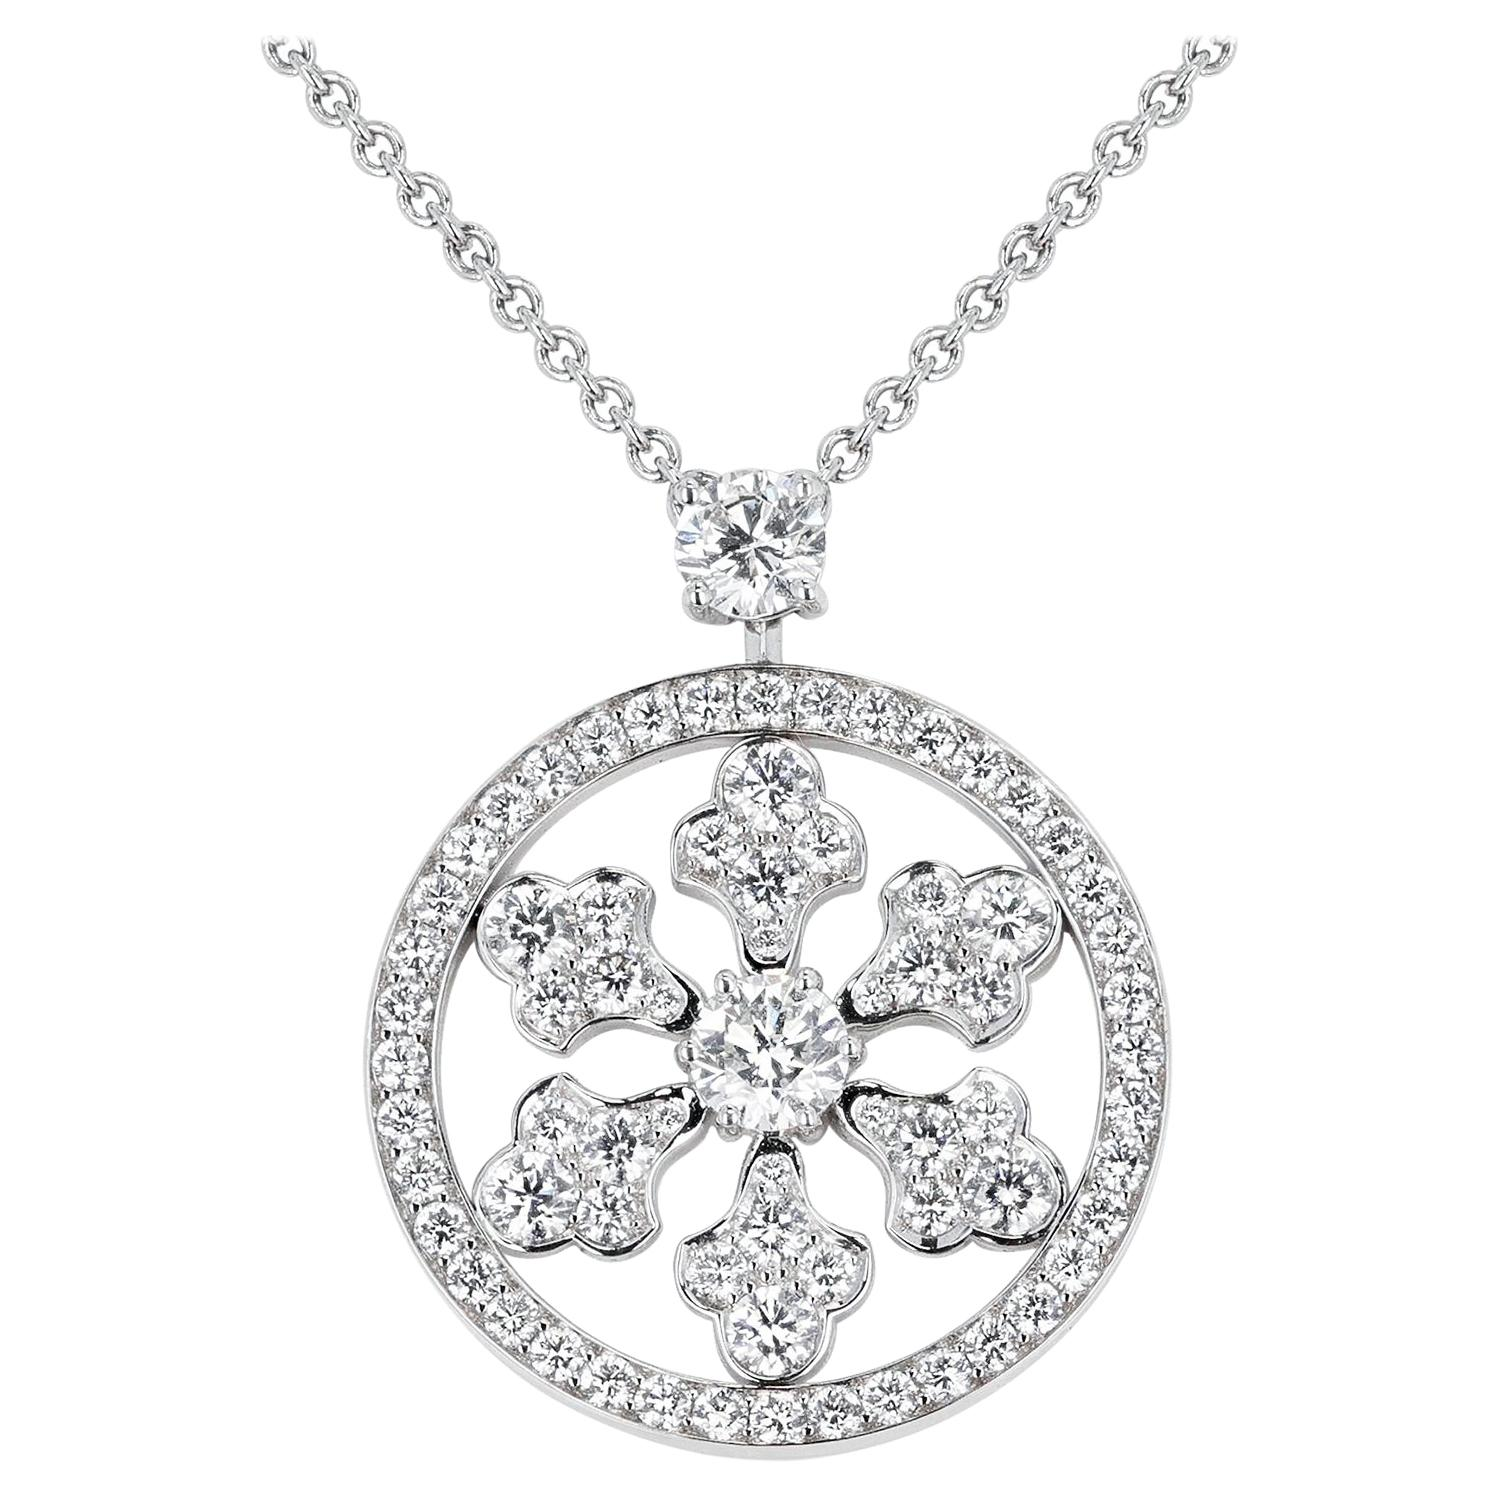 Graff 1.74 Ct. Diamond Snowflake Pendant Necklace, 18k White Gold